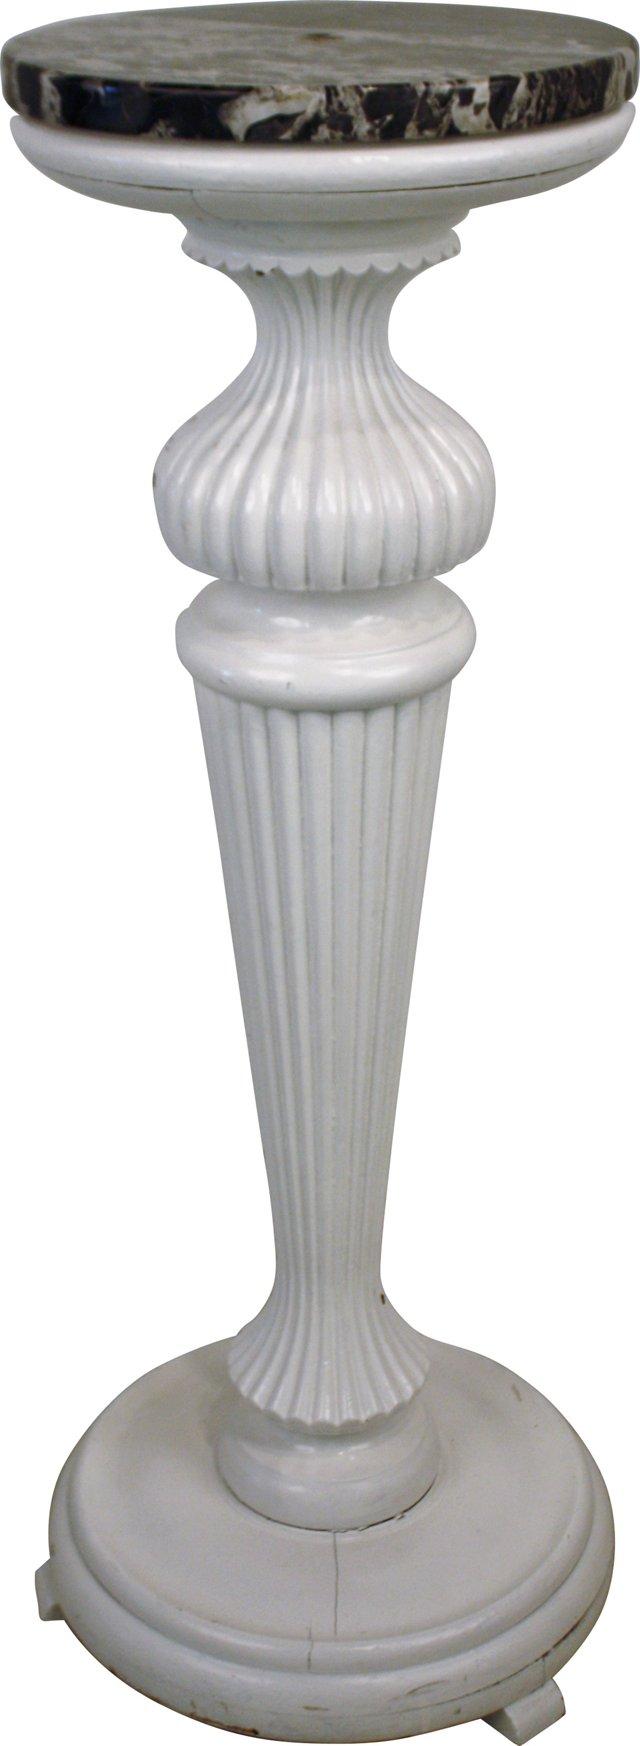 Decorative Marble-Top Pillar